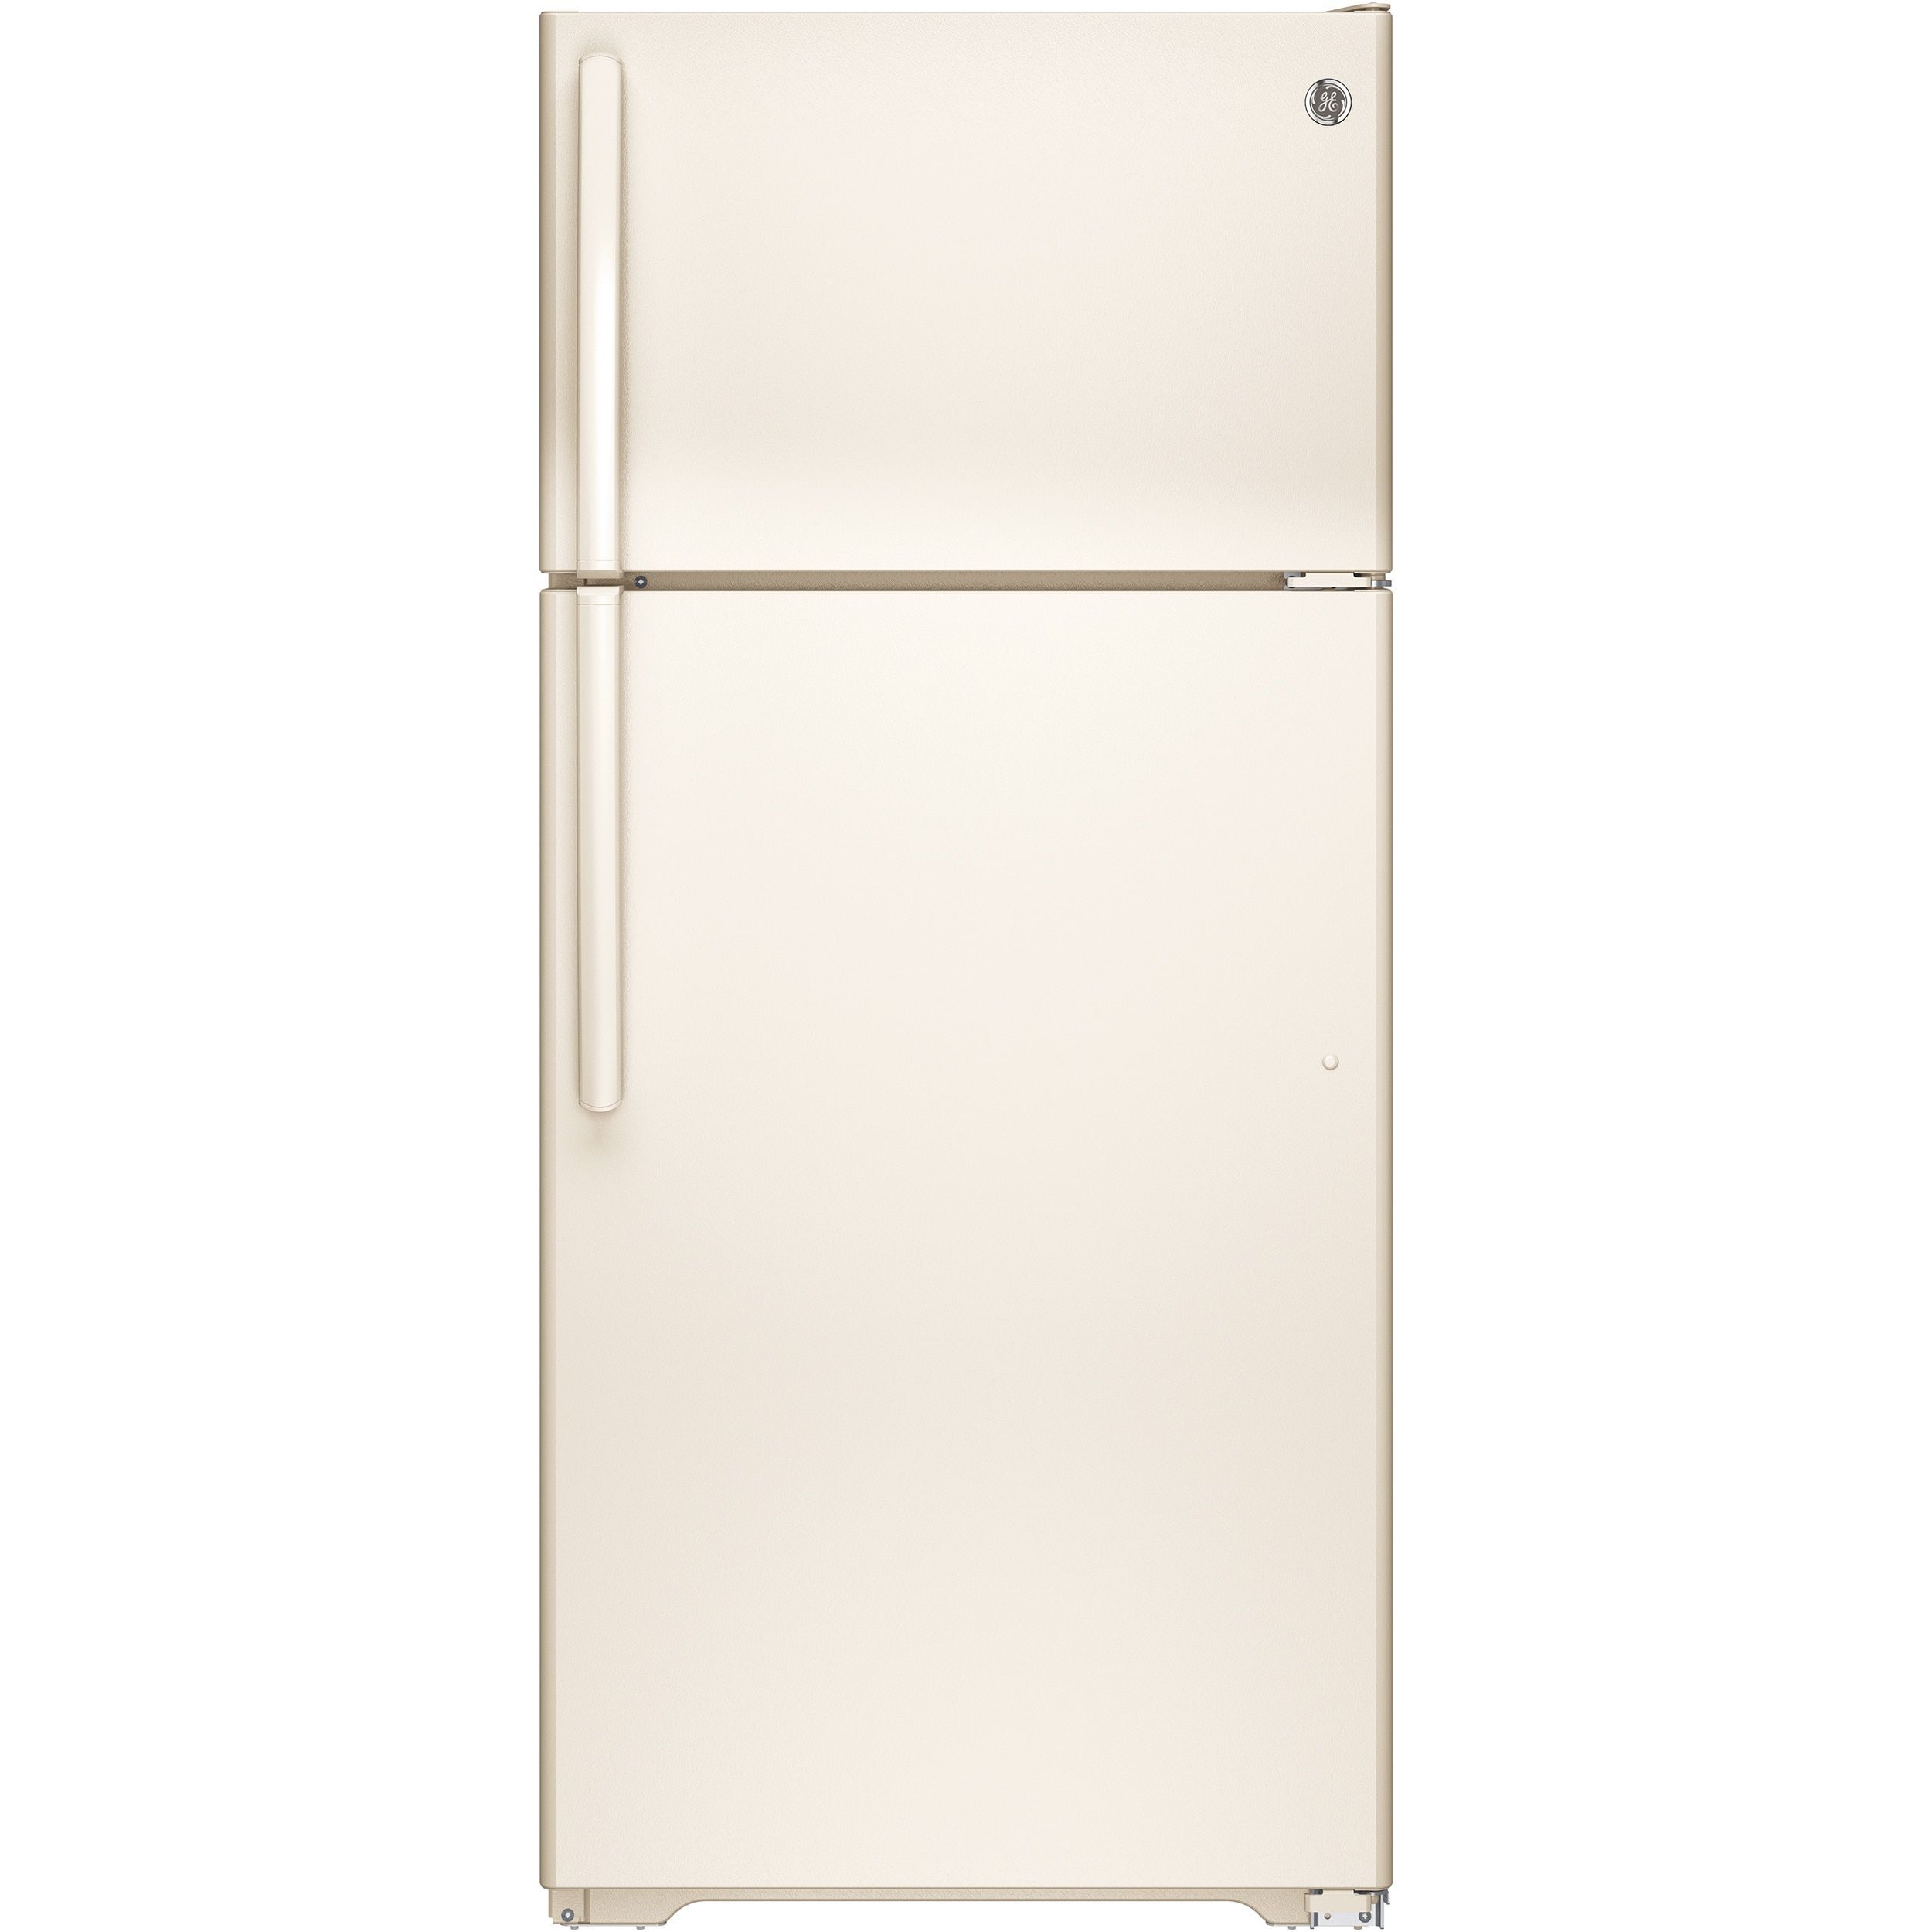 GE Energy Star 15 5 Cubic foot Bisque Top Freezer Refrigerator